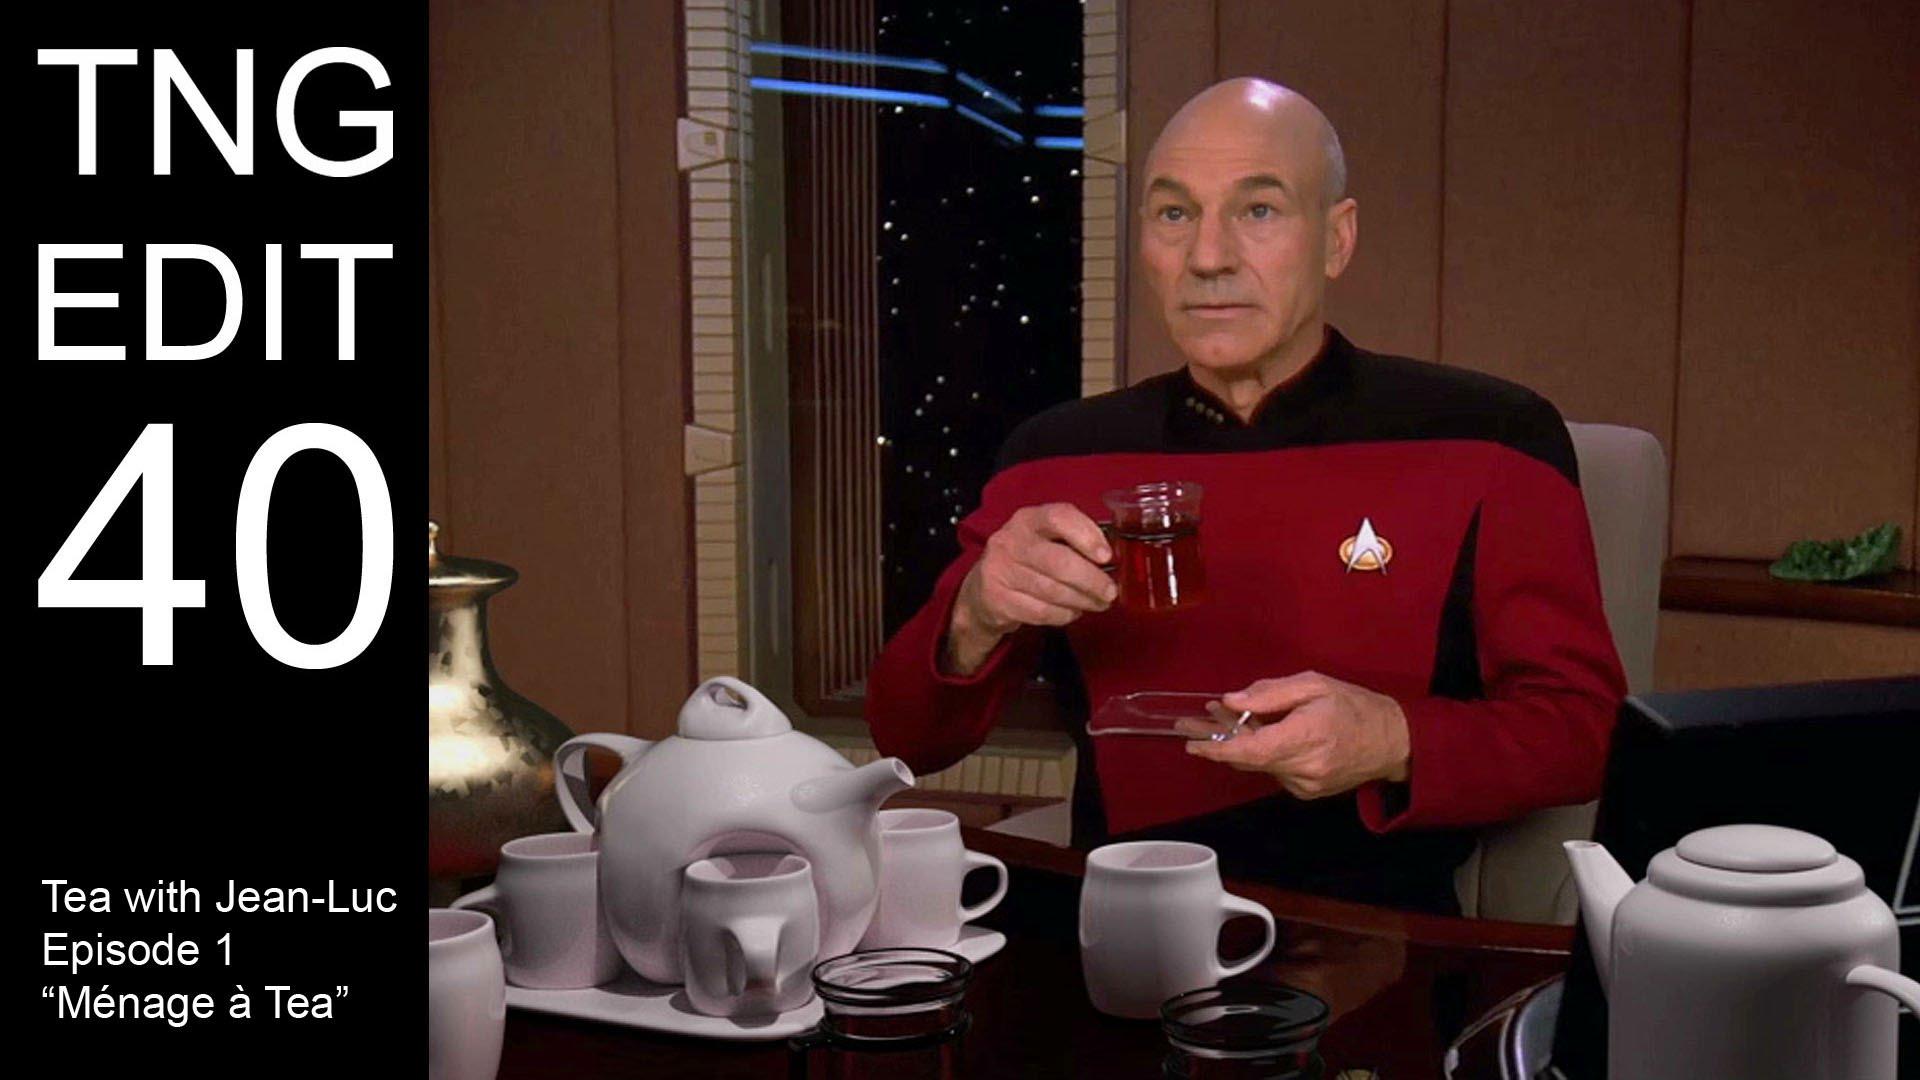 Tea with Jean-Luc